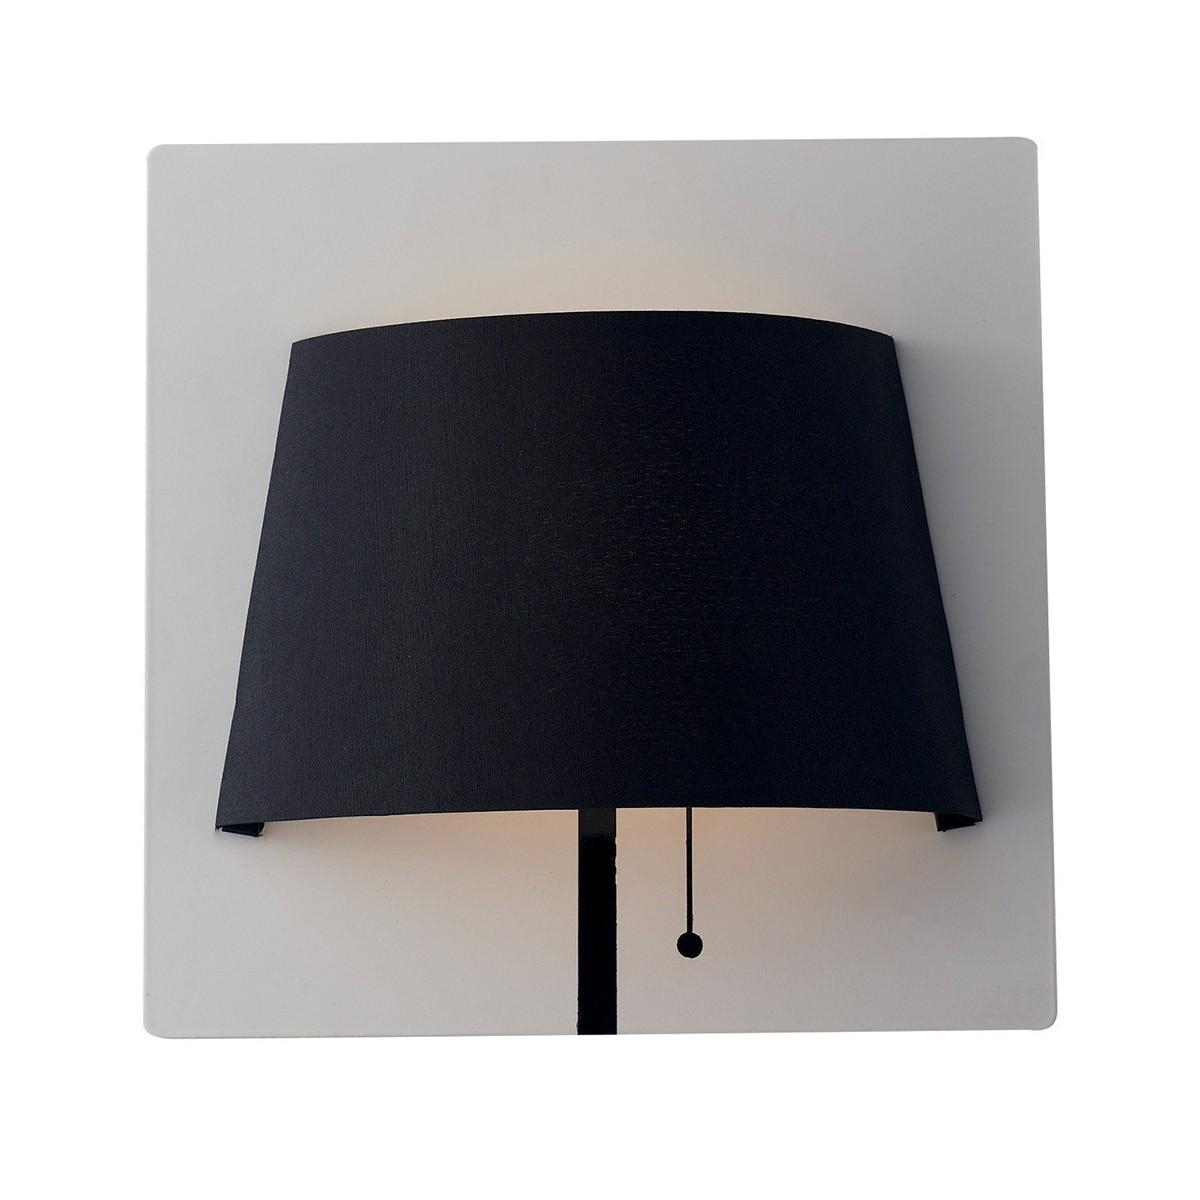 LED-WHAROL-WB - Applique Lampada da Parete Moderna Metallo Bianco Paralume Nero Led 6 watt Luce Naturale